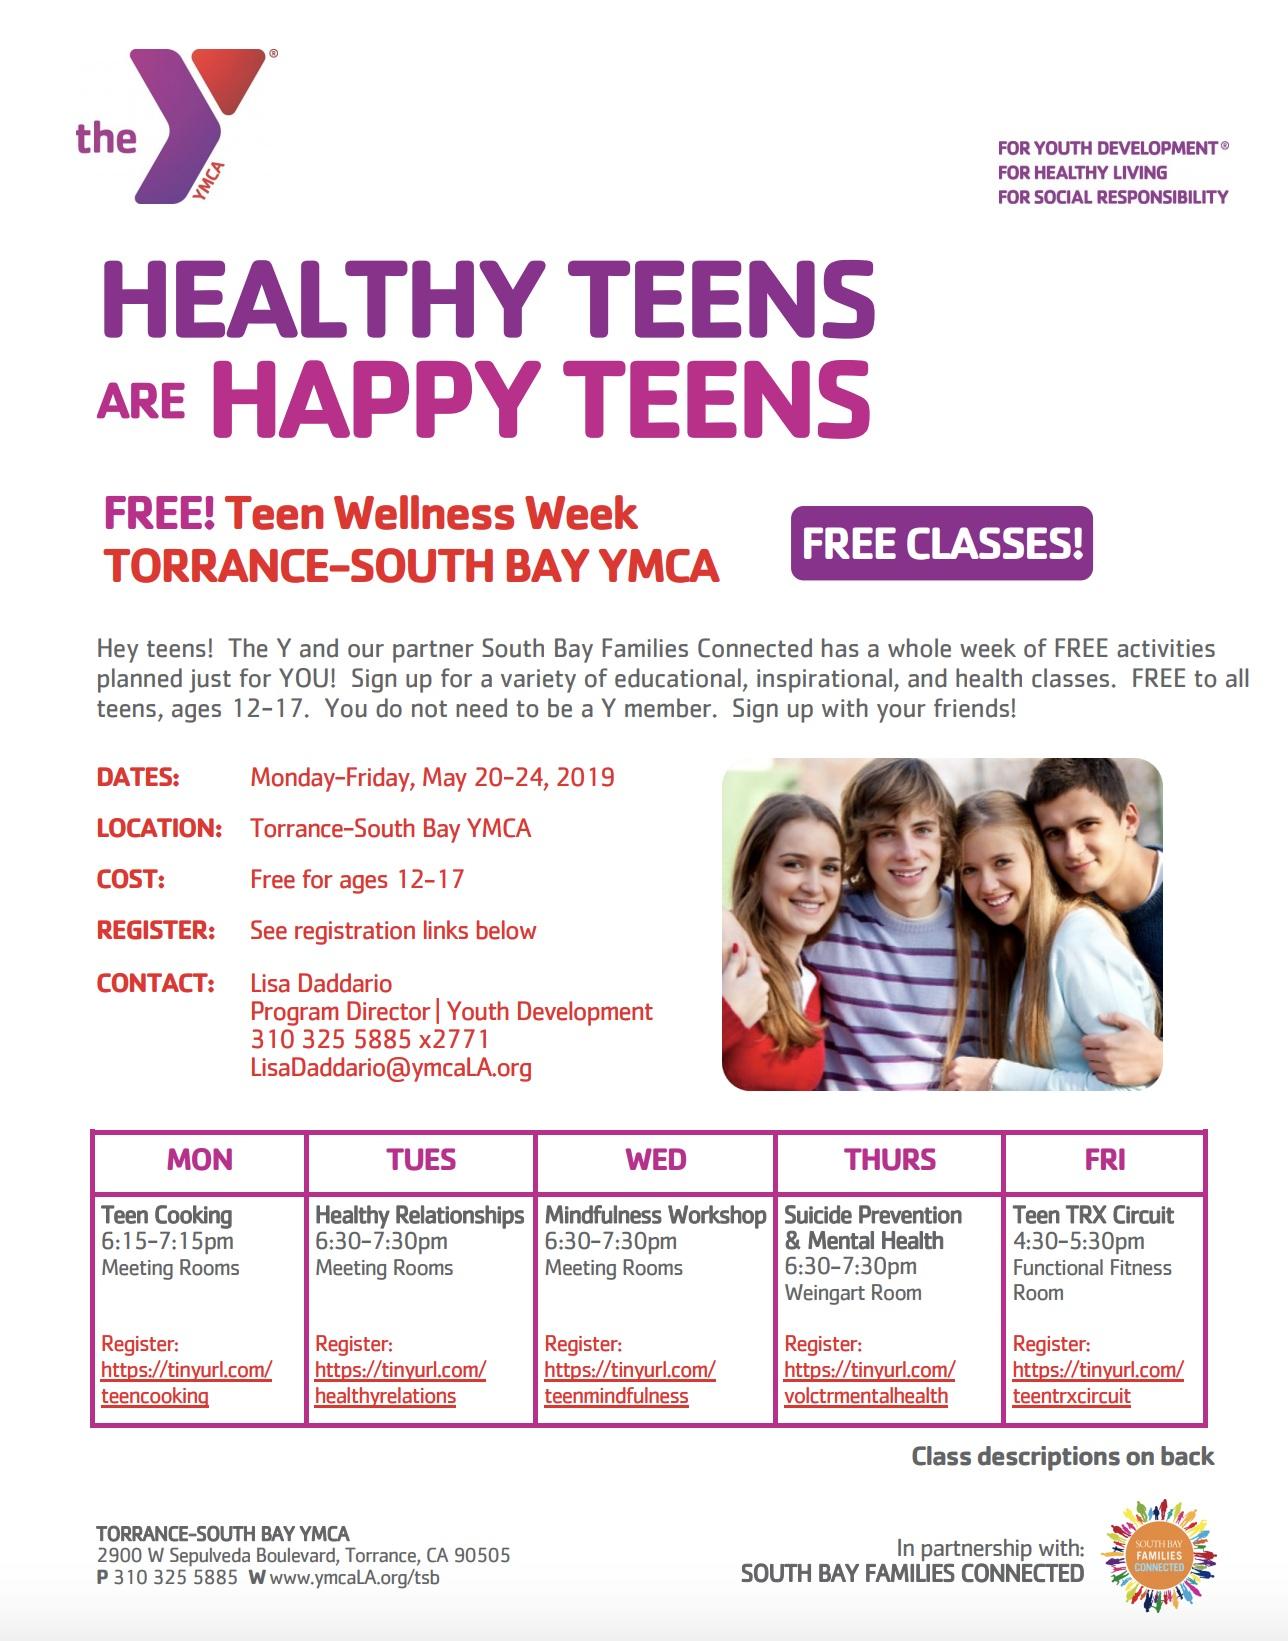 Torrance-South+Bay+YMCA+Healthy+Teens+are+Happy+Teens